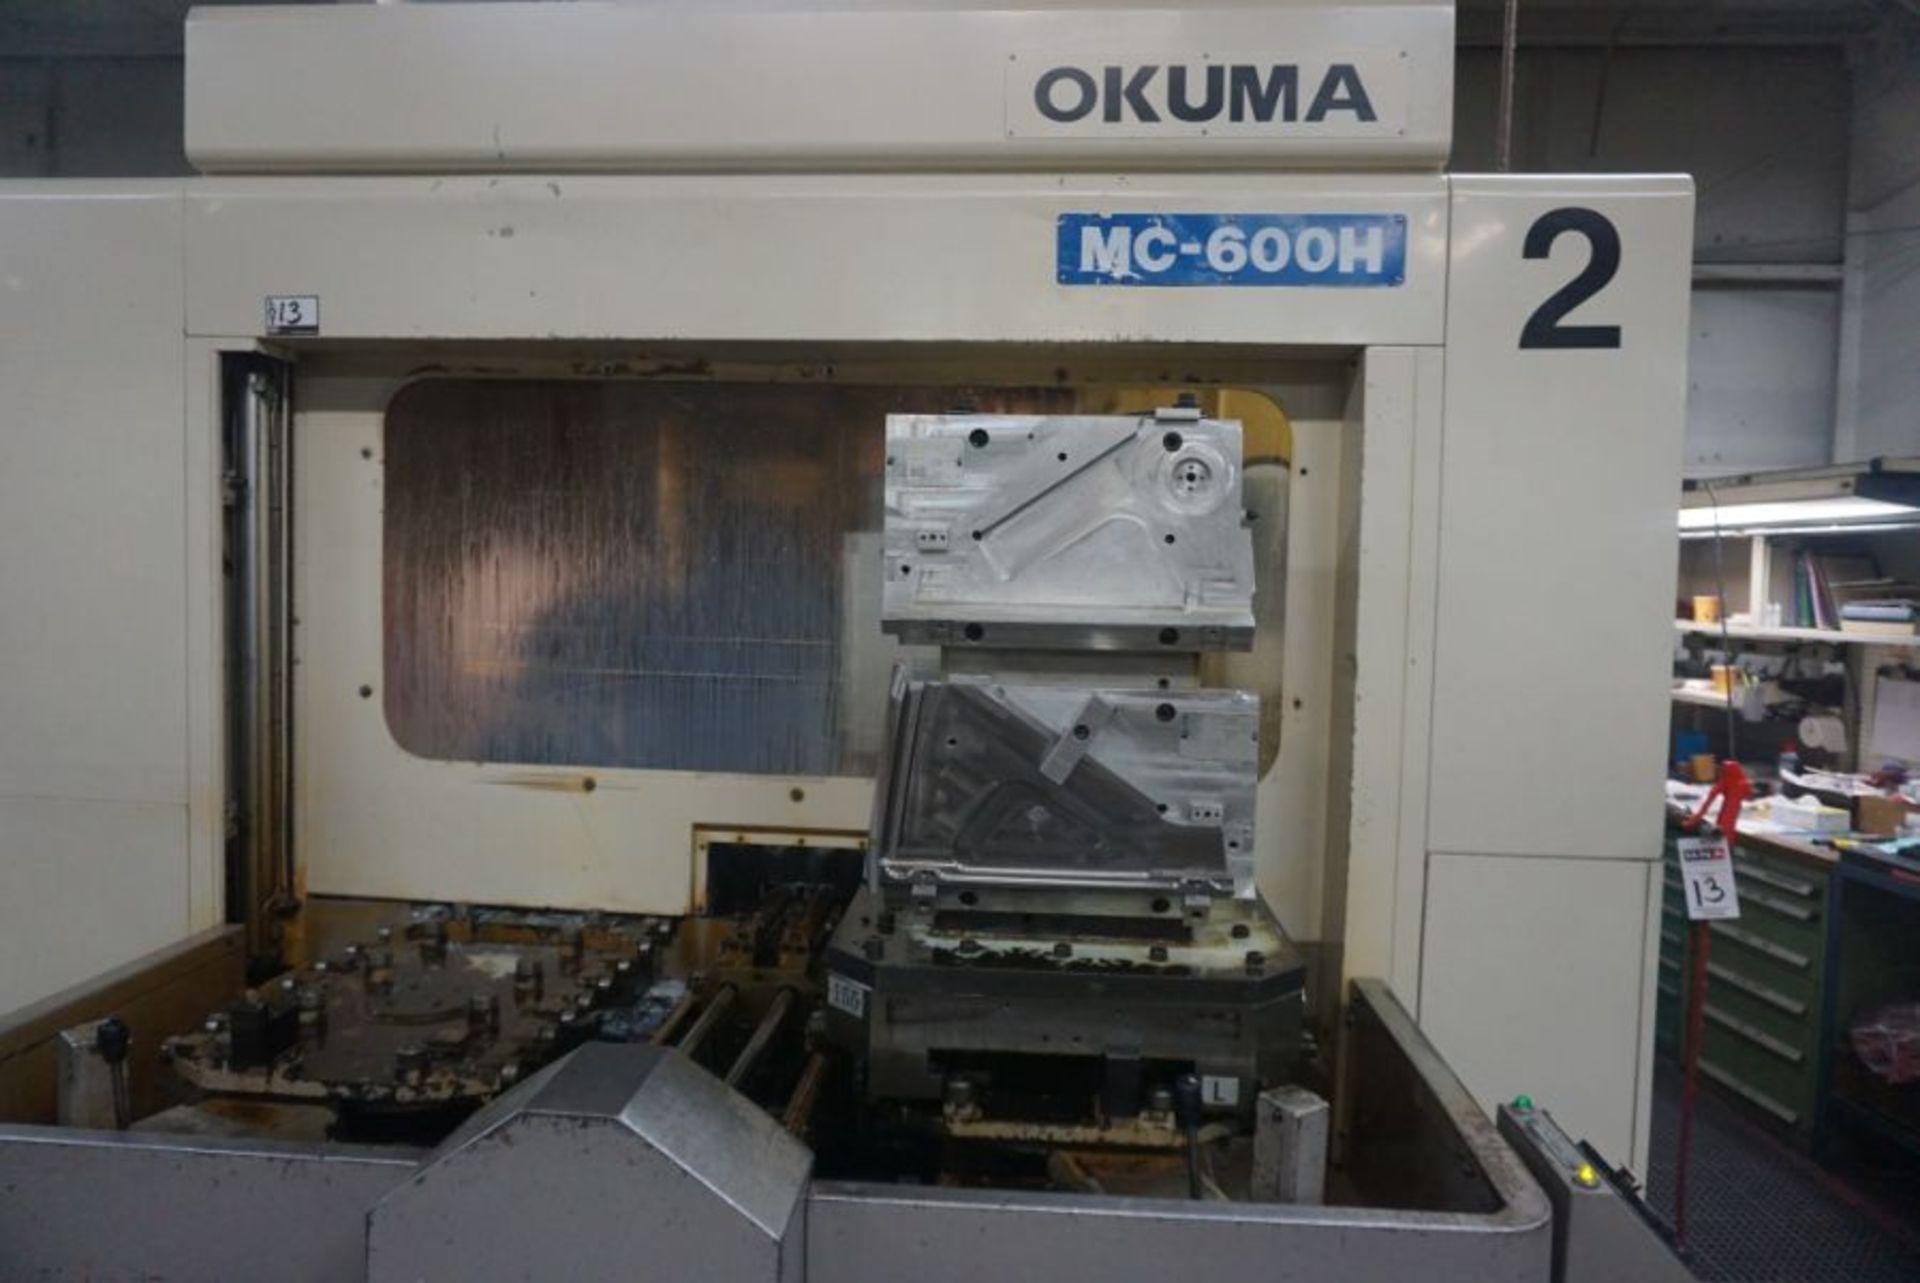 "Okuma 600H 4-Axis HMC, OSP 7000M Control, 39.45"" x 31.57"" x 29.64"" Travels, 360 Deg. B, (2) Pallets, - Image 5 of 8"